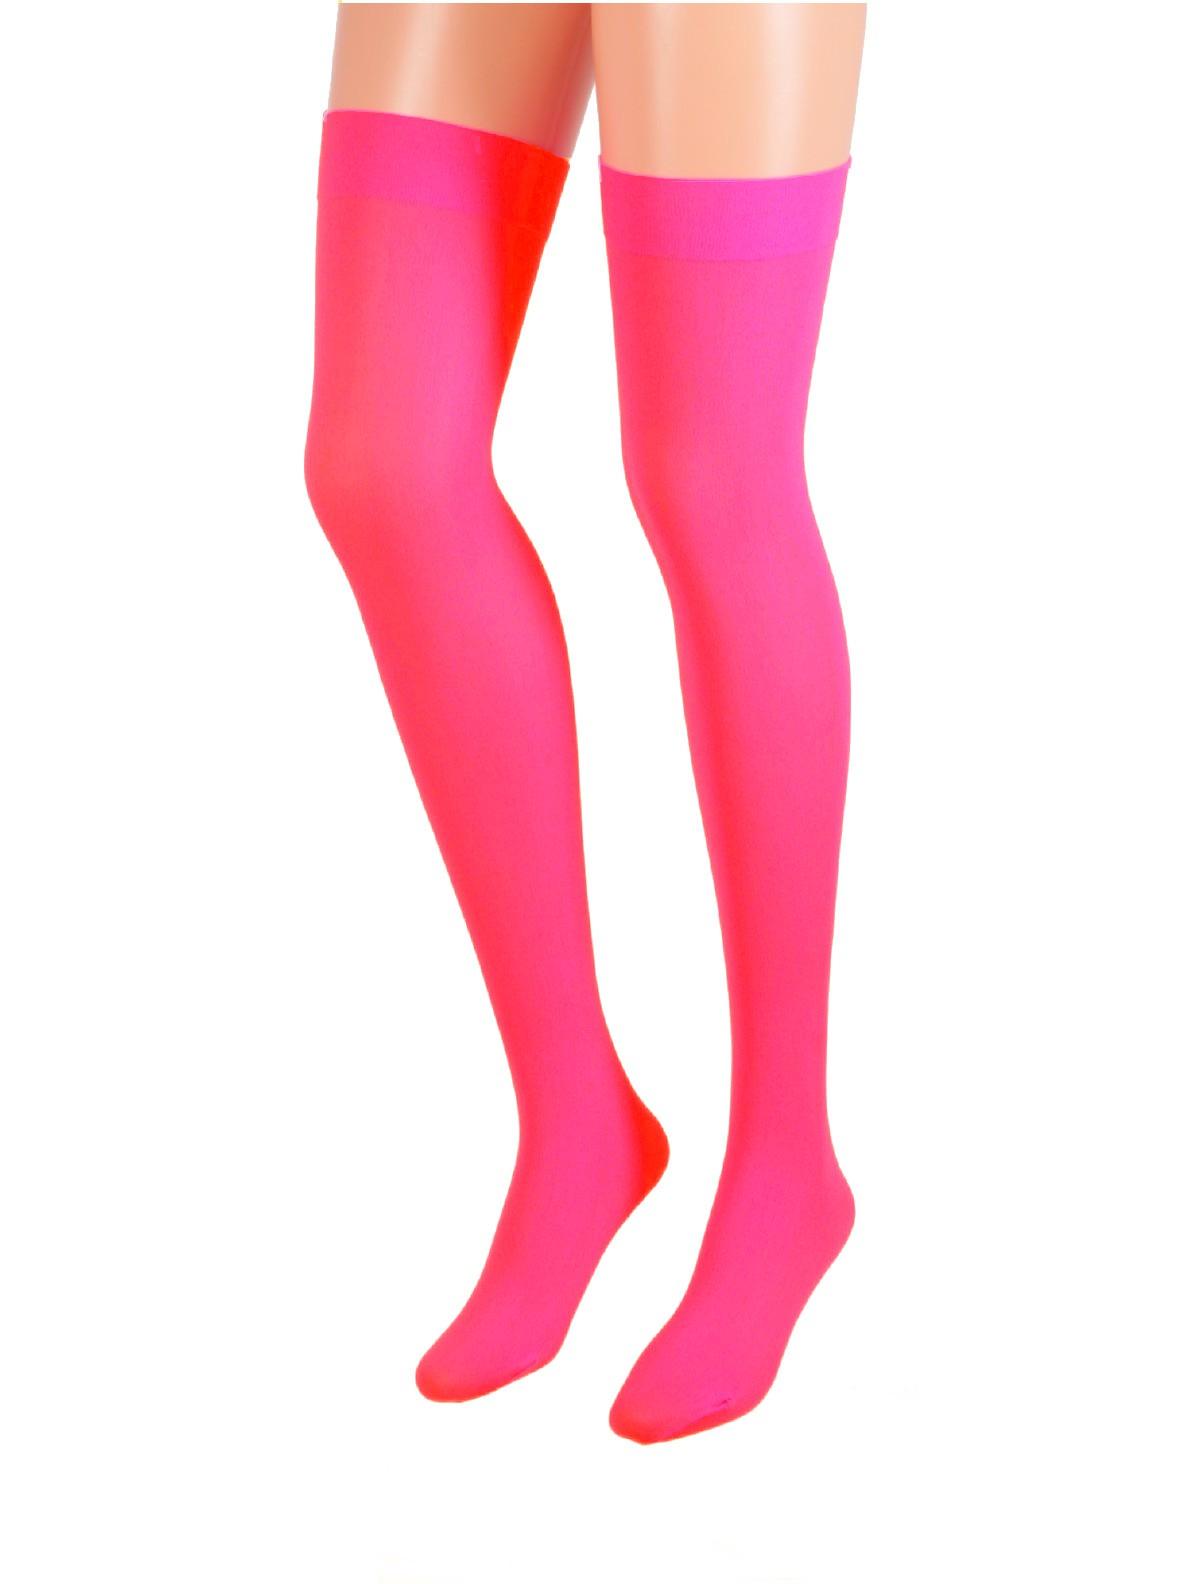 b9516868de2 ... Leg Avenue Opaque Nylon Hold-Ups neon pink